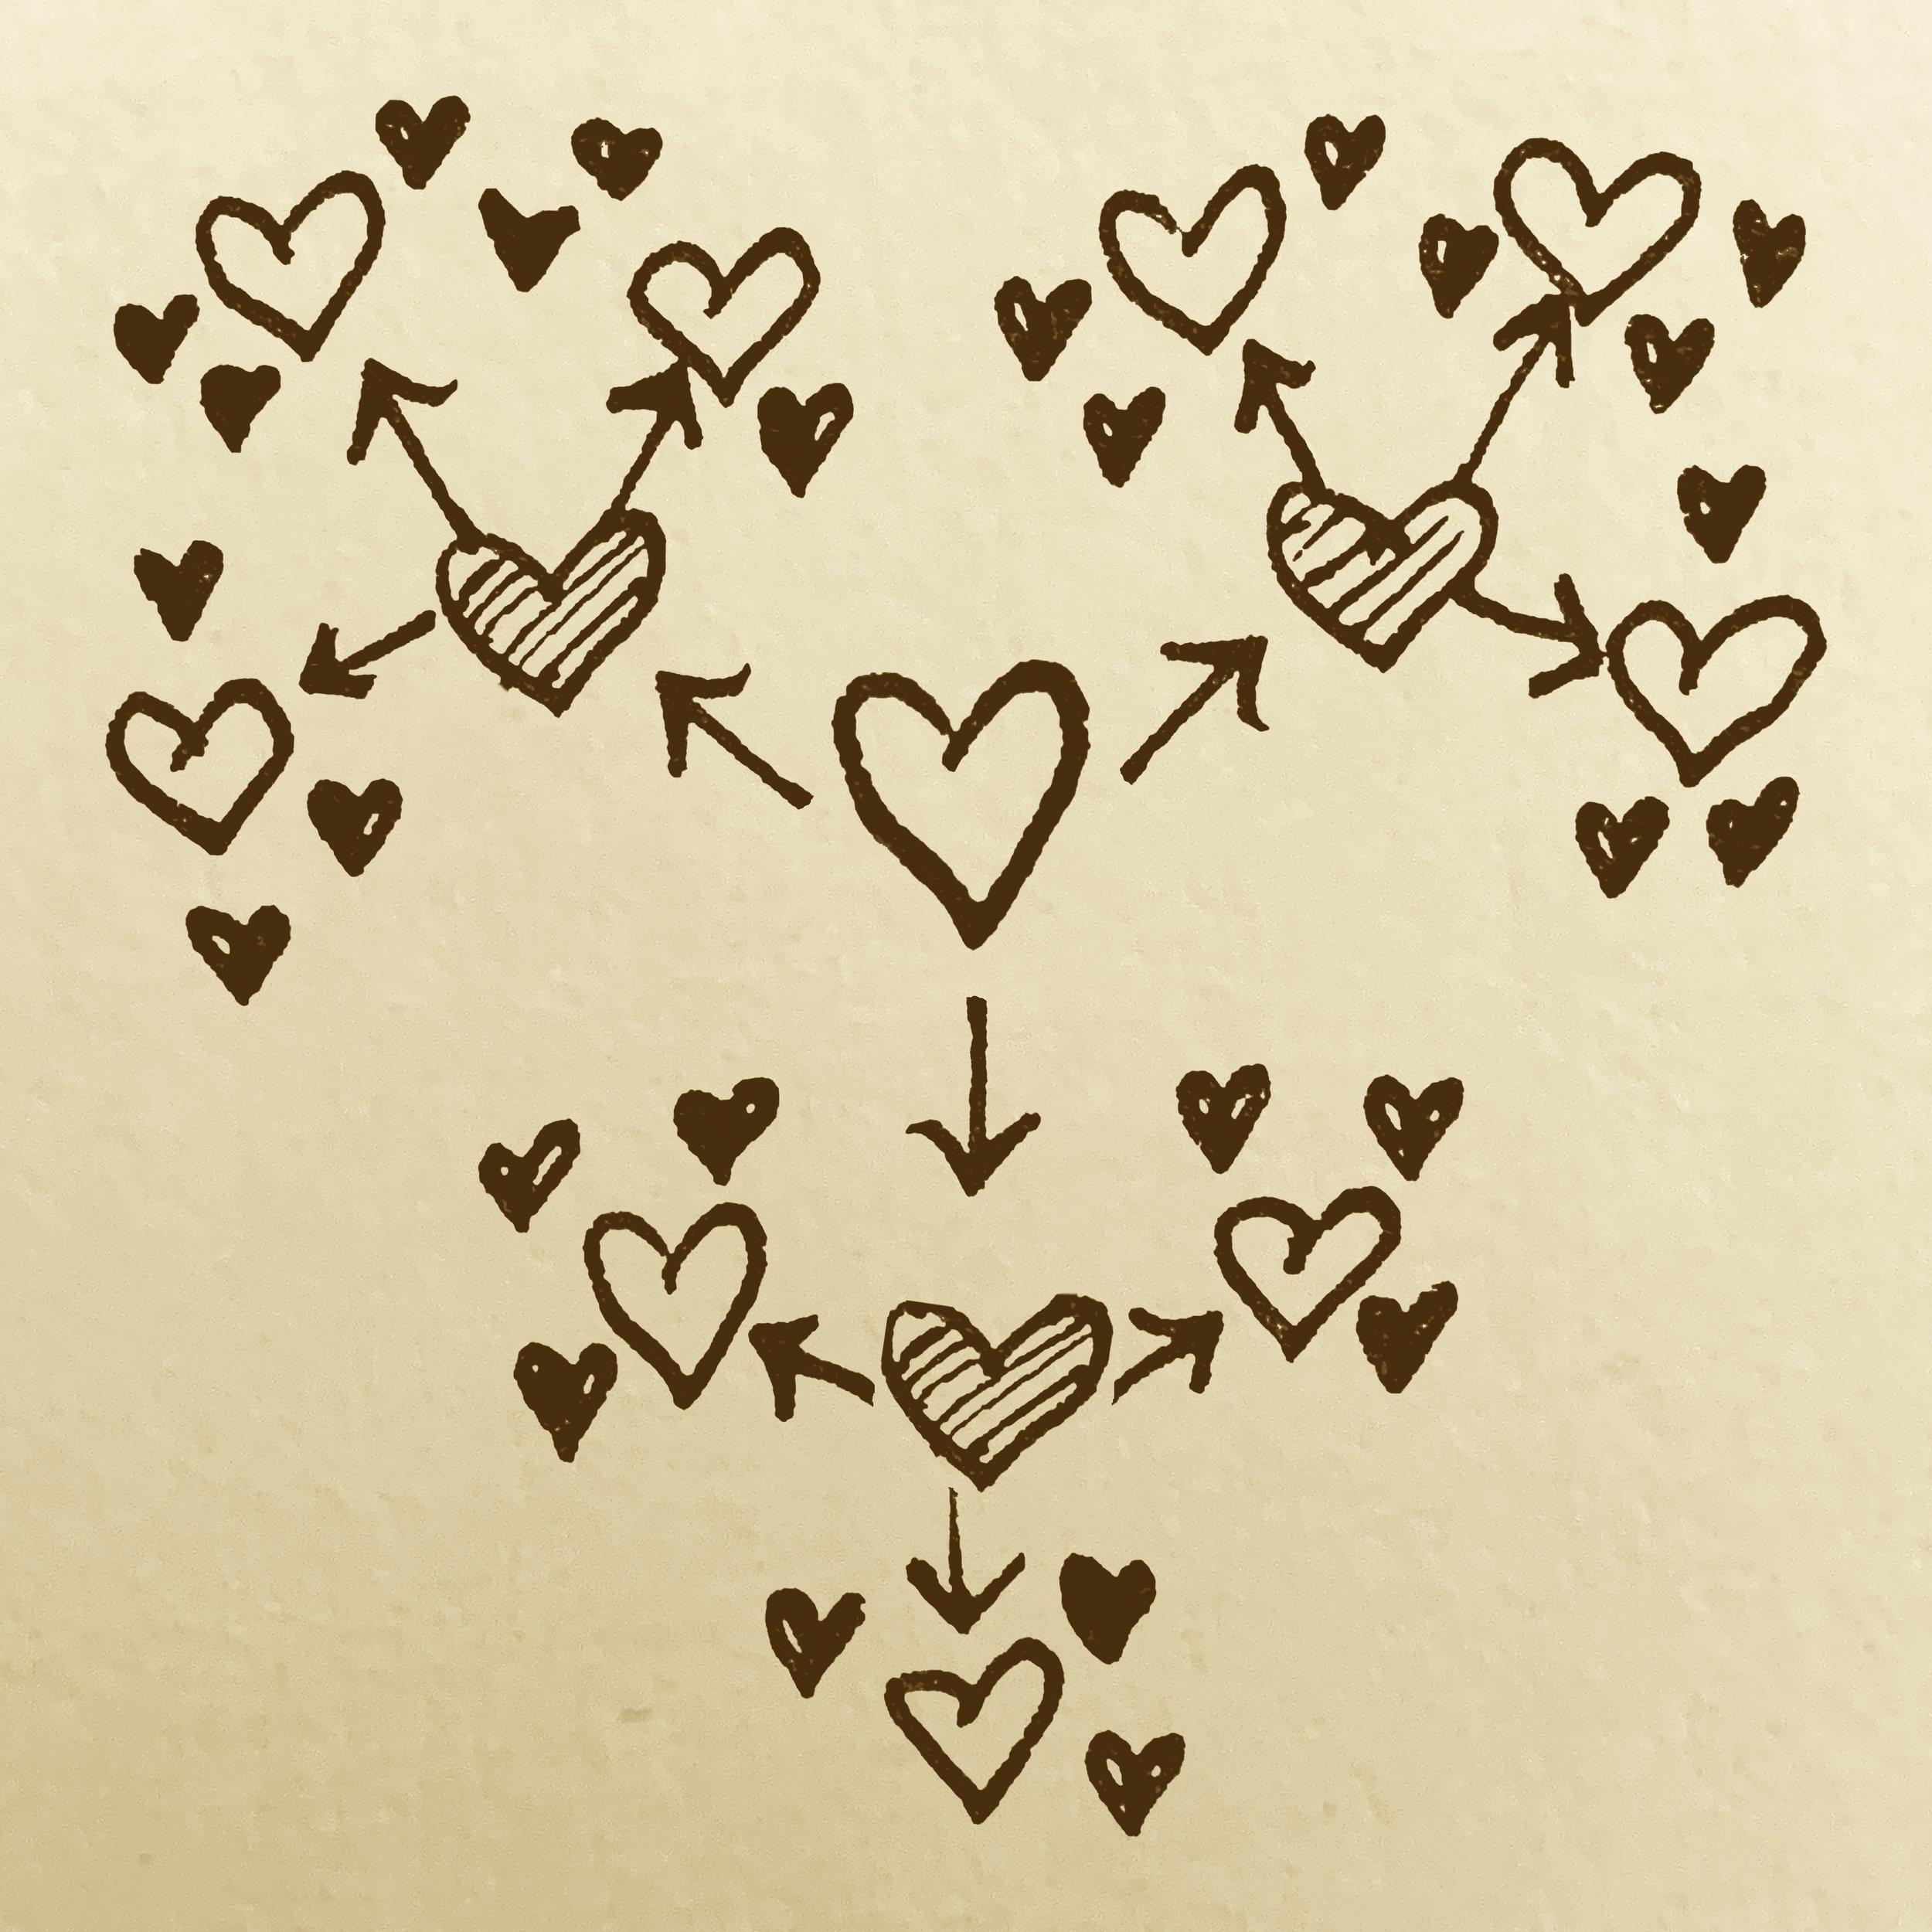 multiplying hearts.jpg